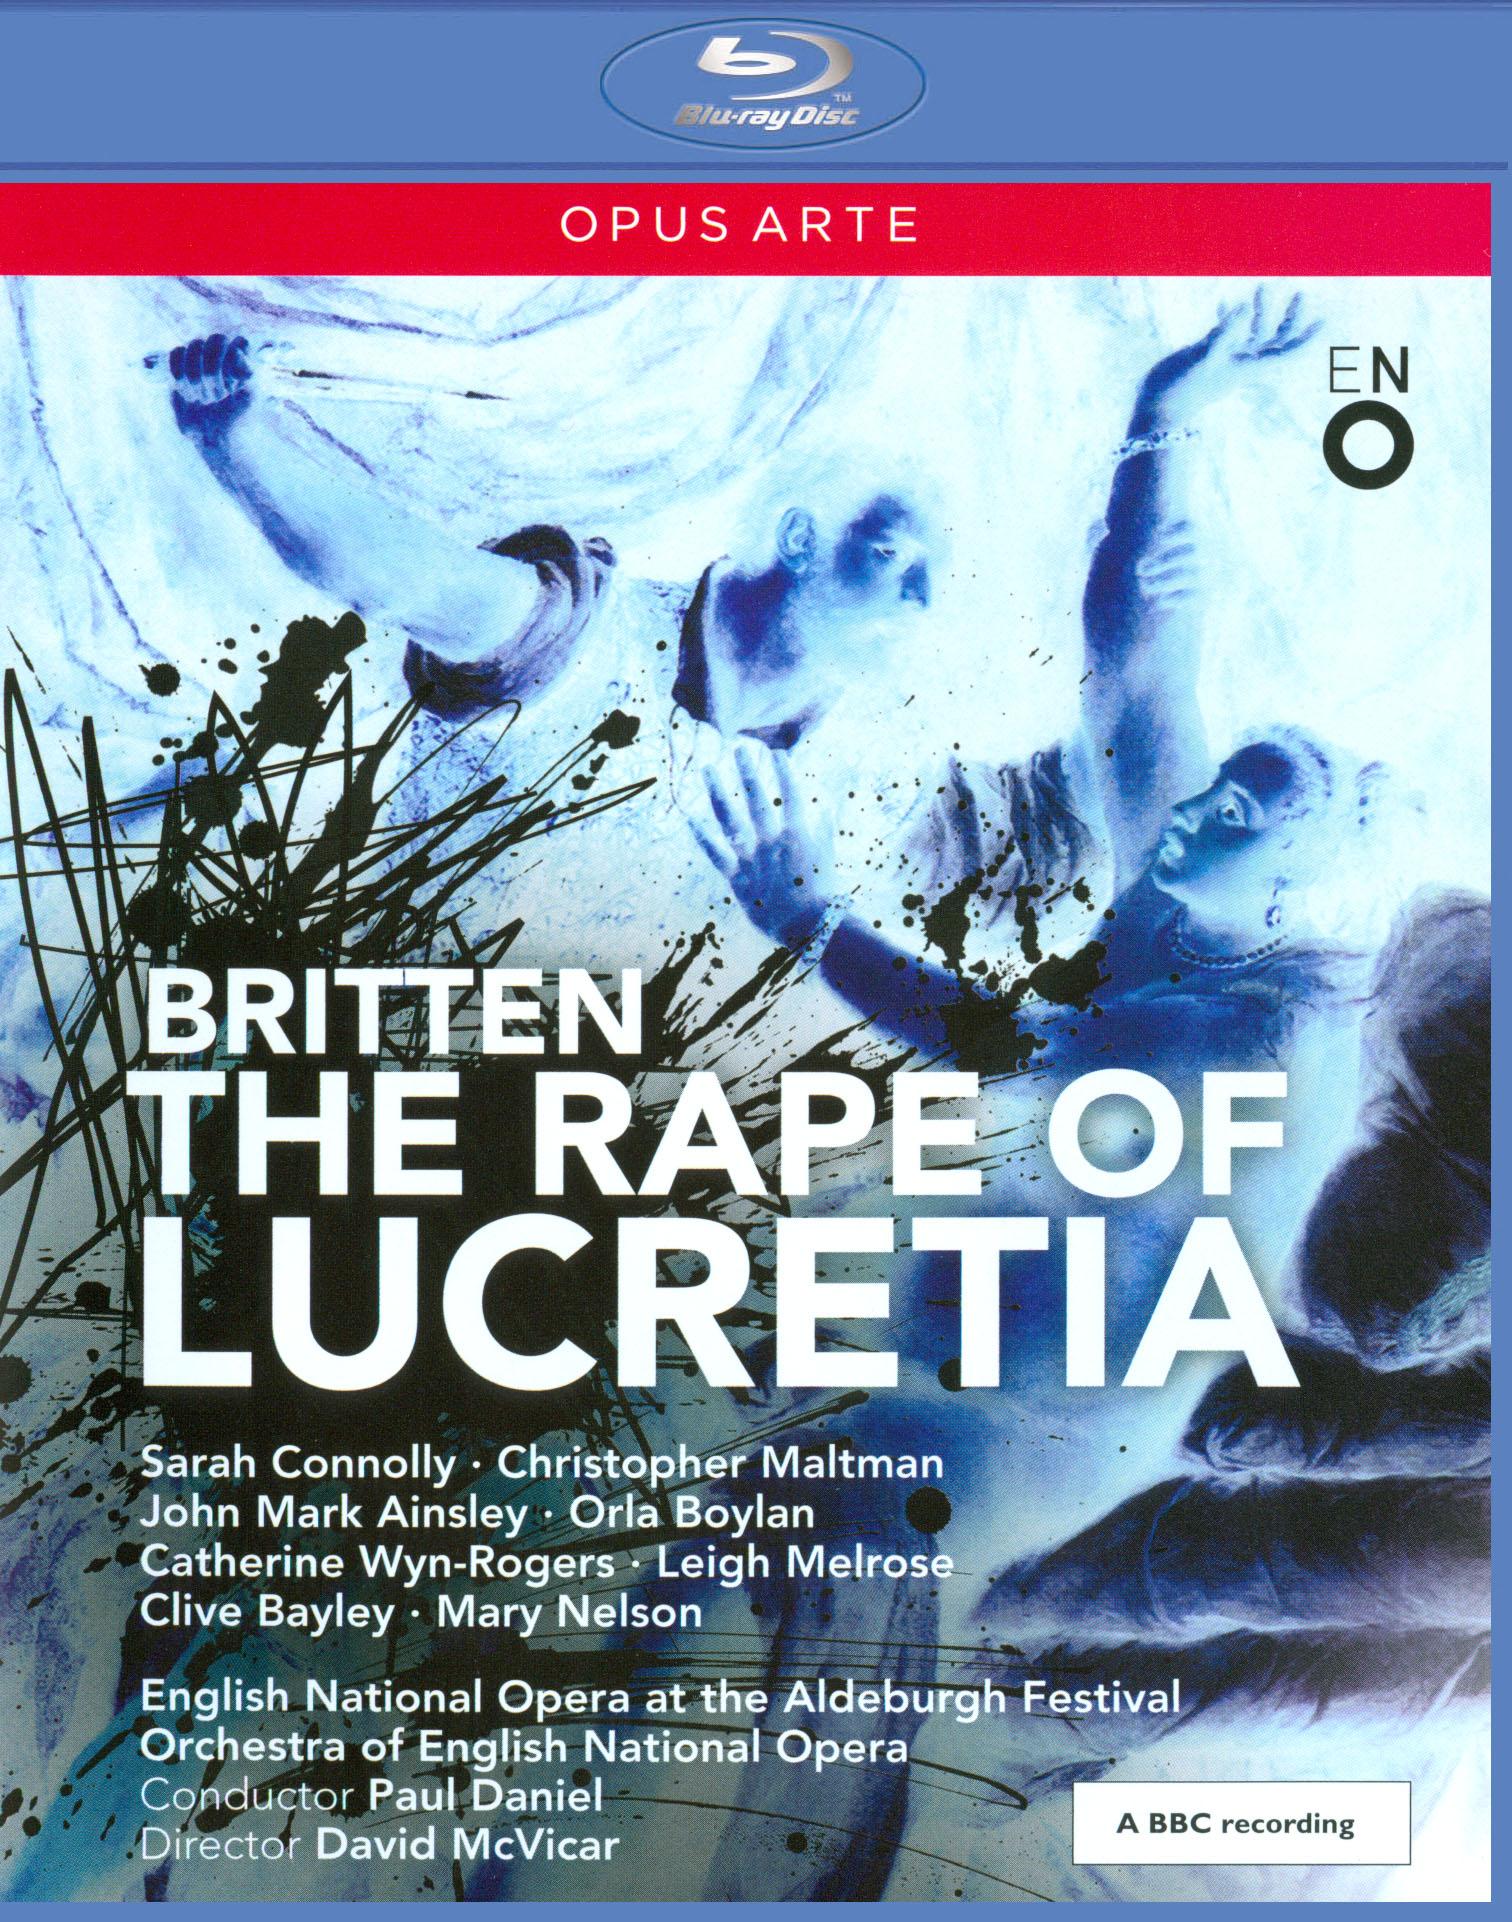 The Rape of Lucretia (English National Opera)